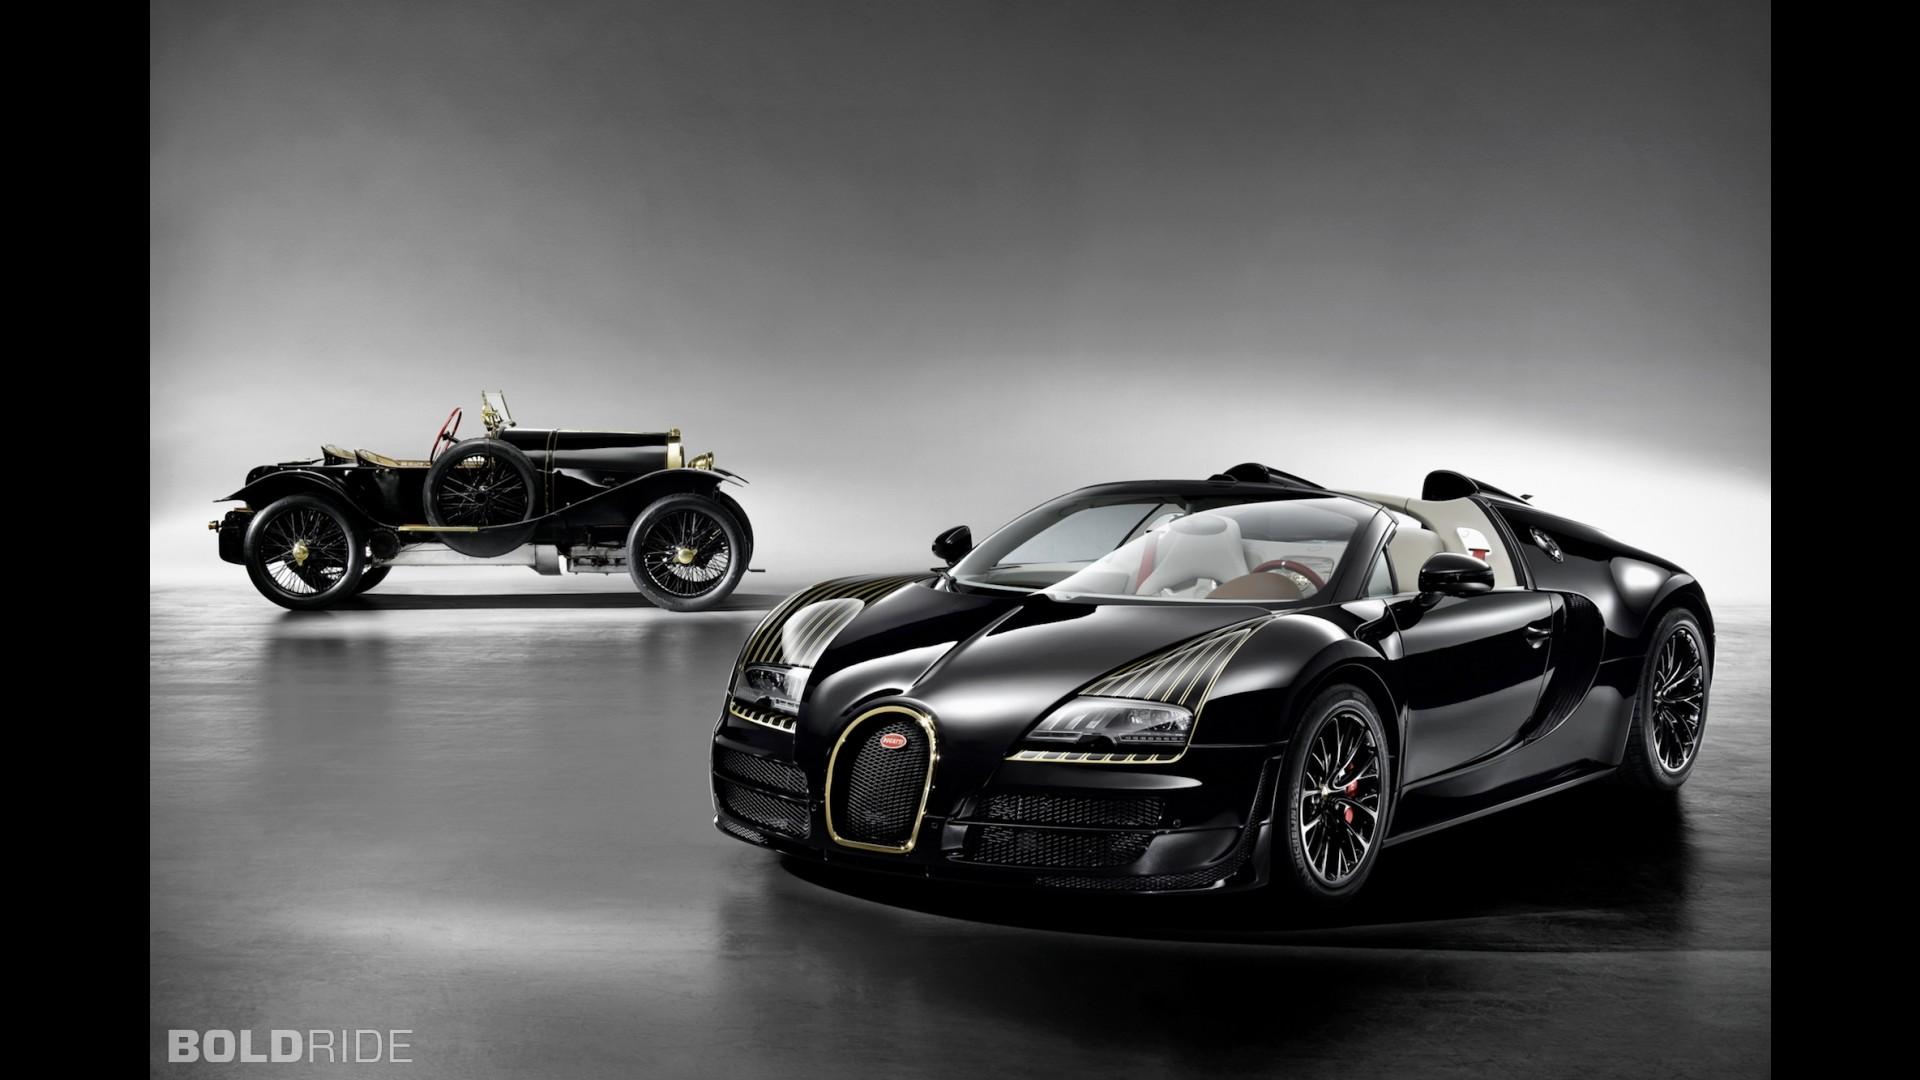 bugatti-veyron-grand-sport-vitesse-black-bess Extraordinary Bugatti Veyron Grand Sport Vitesse Cars Trend